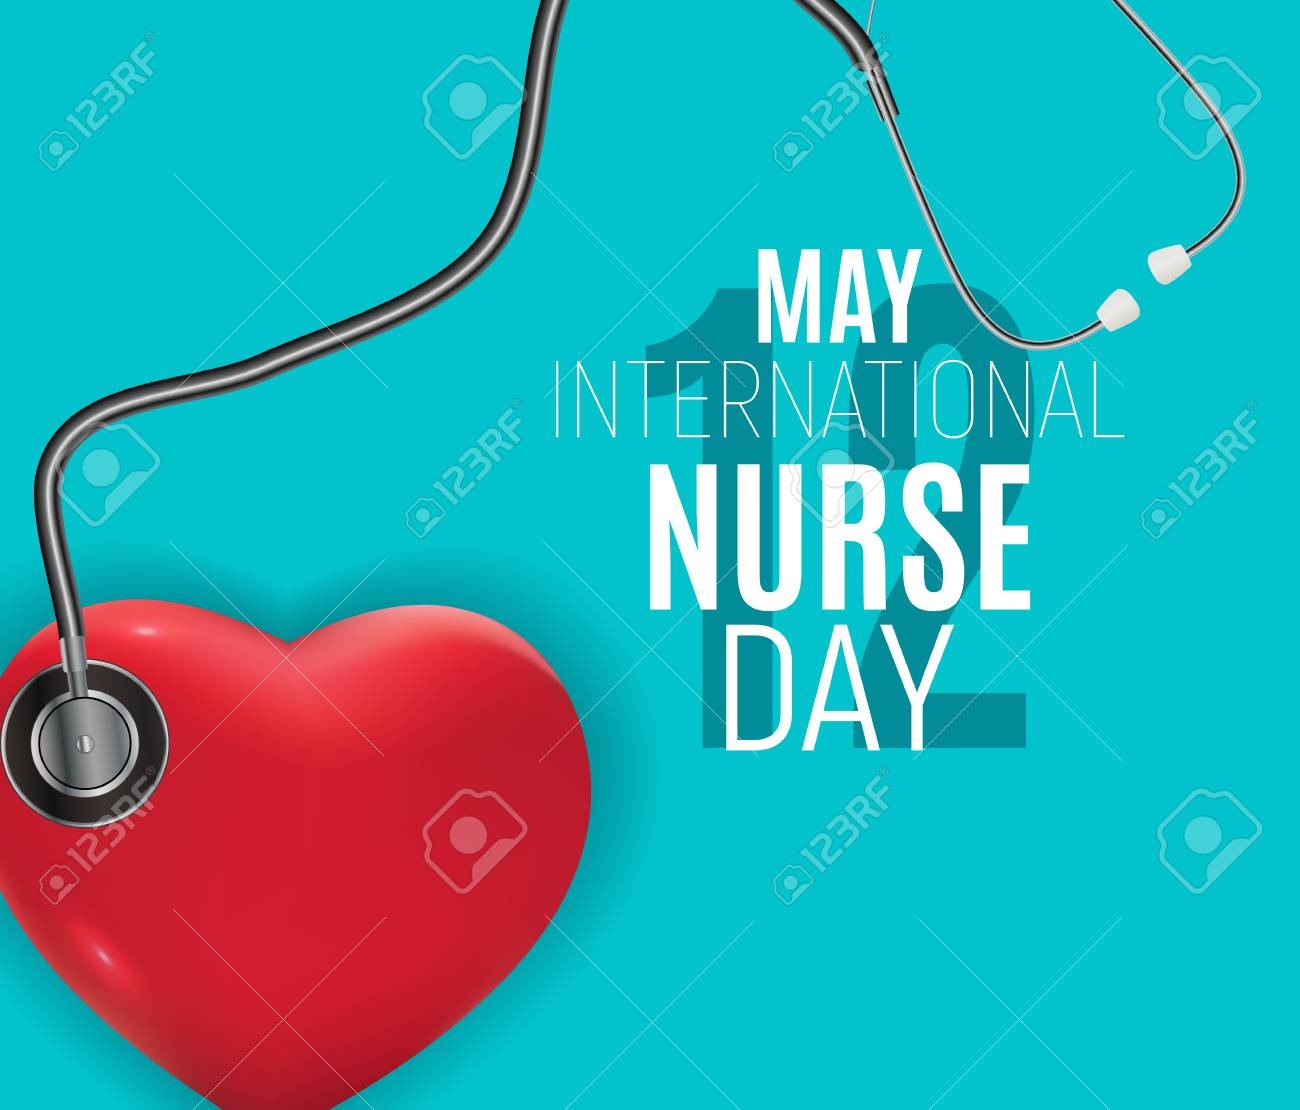 12 May International Nurse Day Medical background Vector illustration EPS10 - 124640385